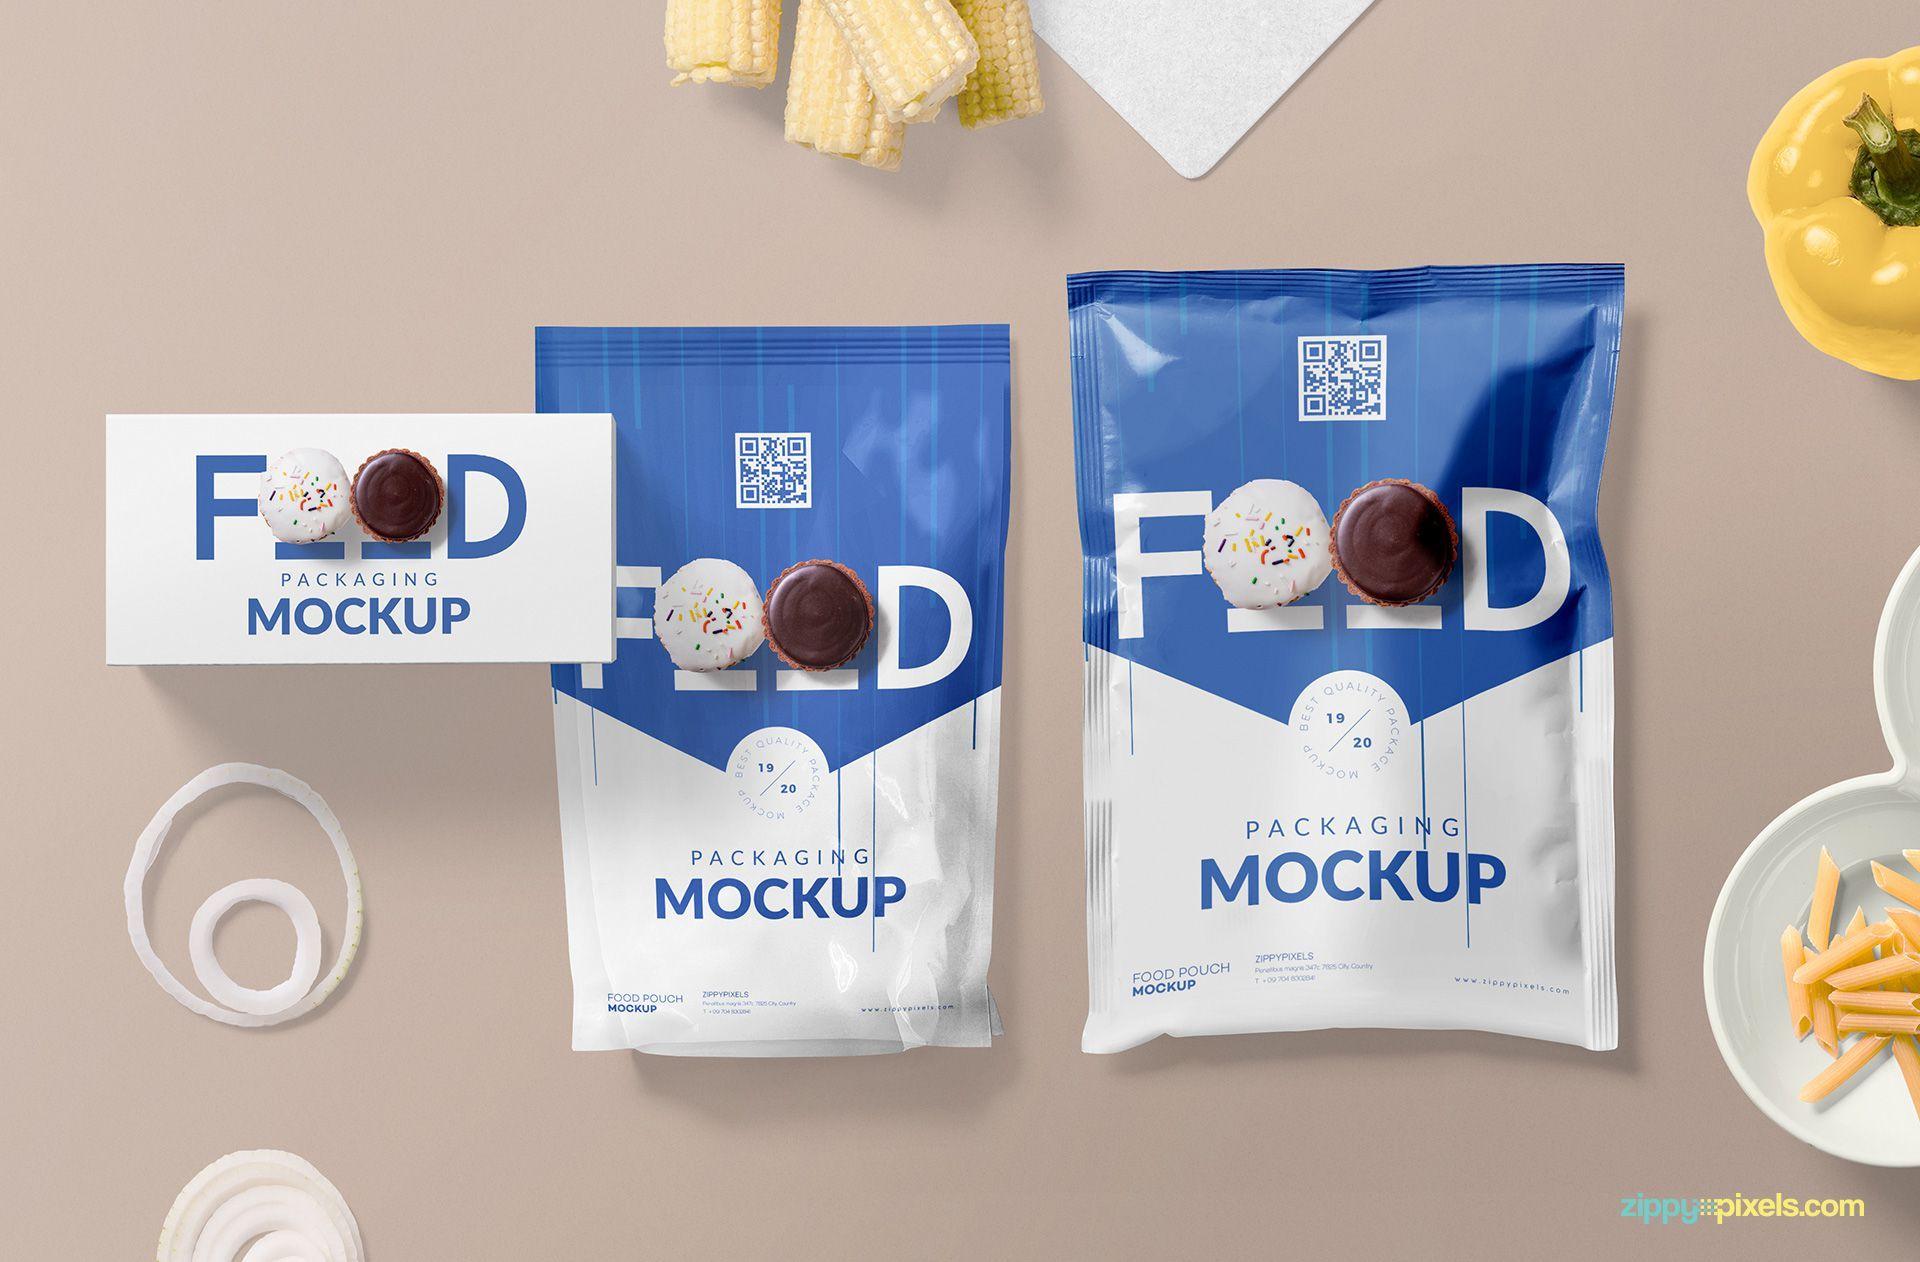 Download Awesome Food Packaging Mockup Free Psd Zippypixels Packaging Mockup Food Packaging Free Packaging Mockup